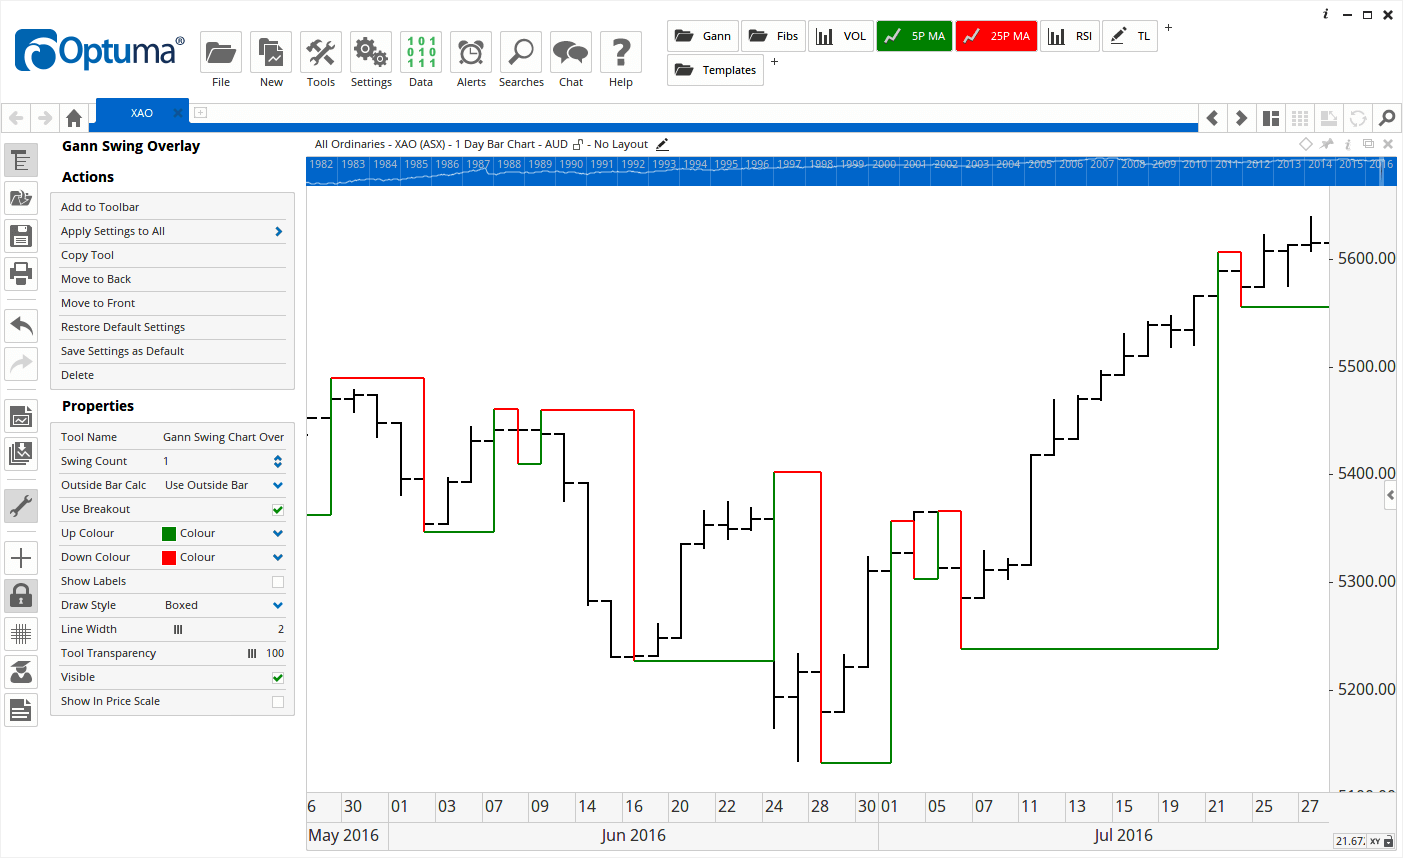 Gann Swing Chart Overlay